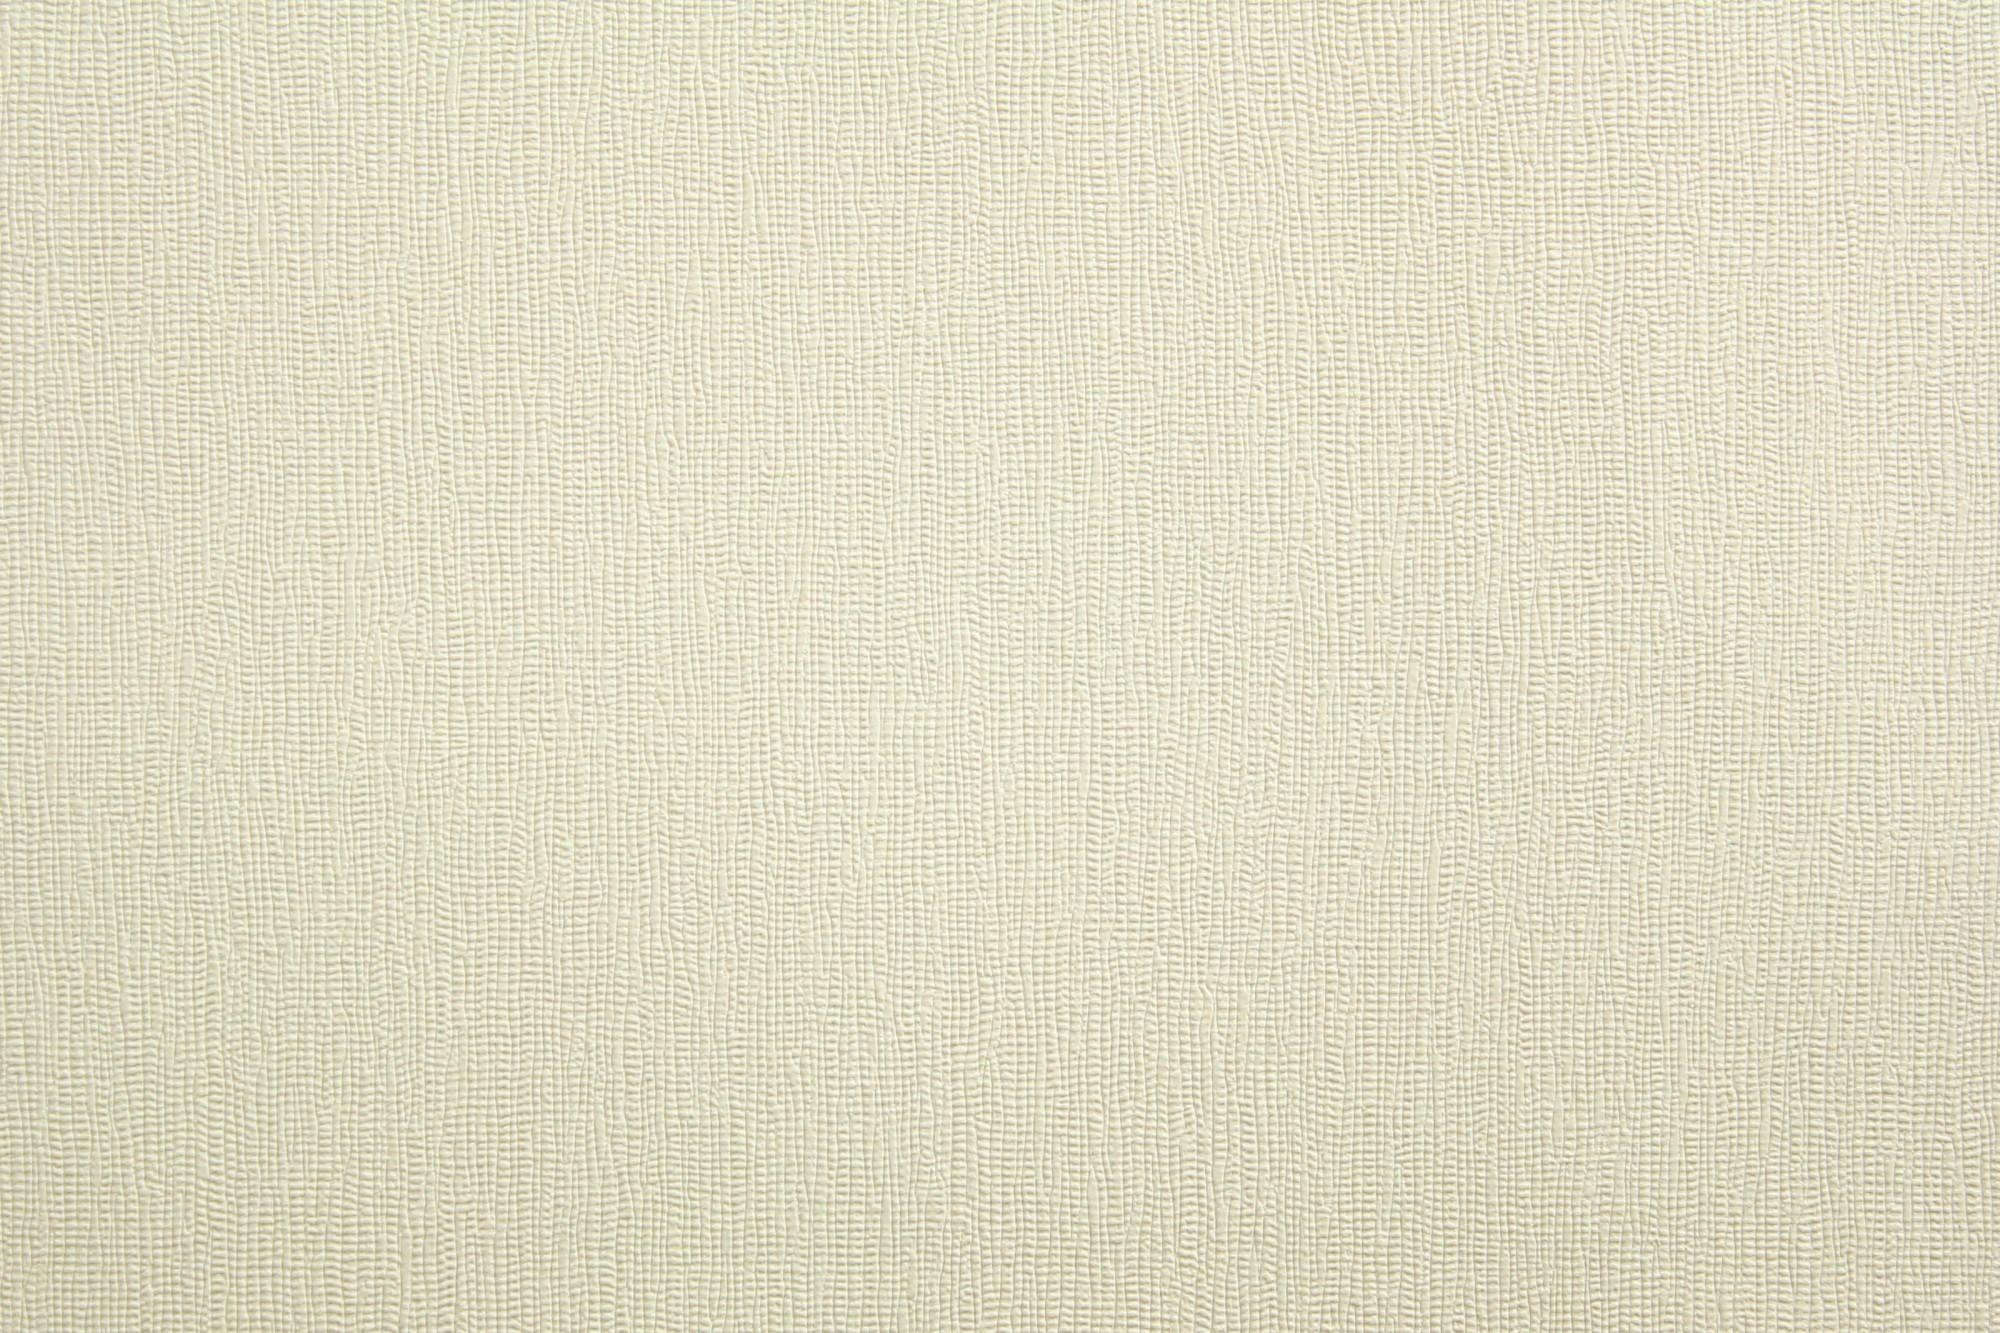 tapete rasch seduction vliestapete 796315 uni creme wei. Black Bedroom Furniture Sets. Home Design Ideas